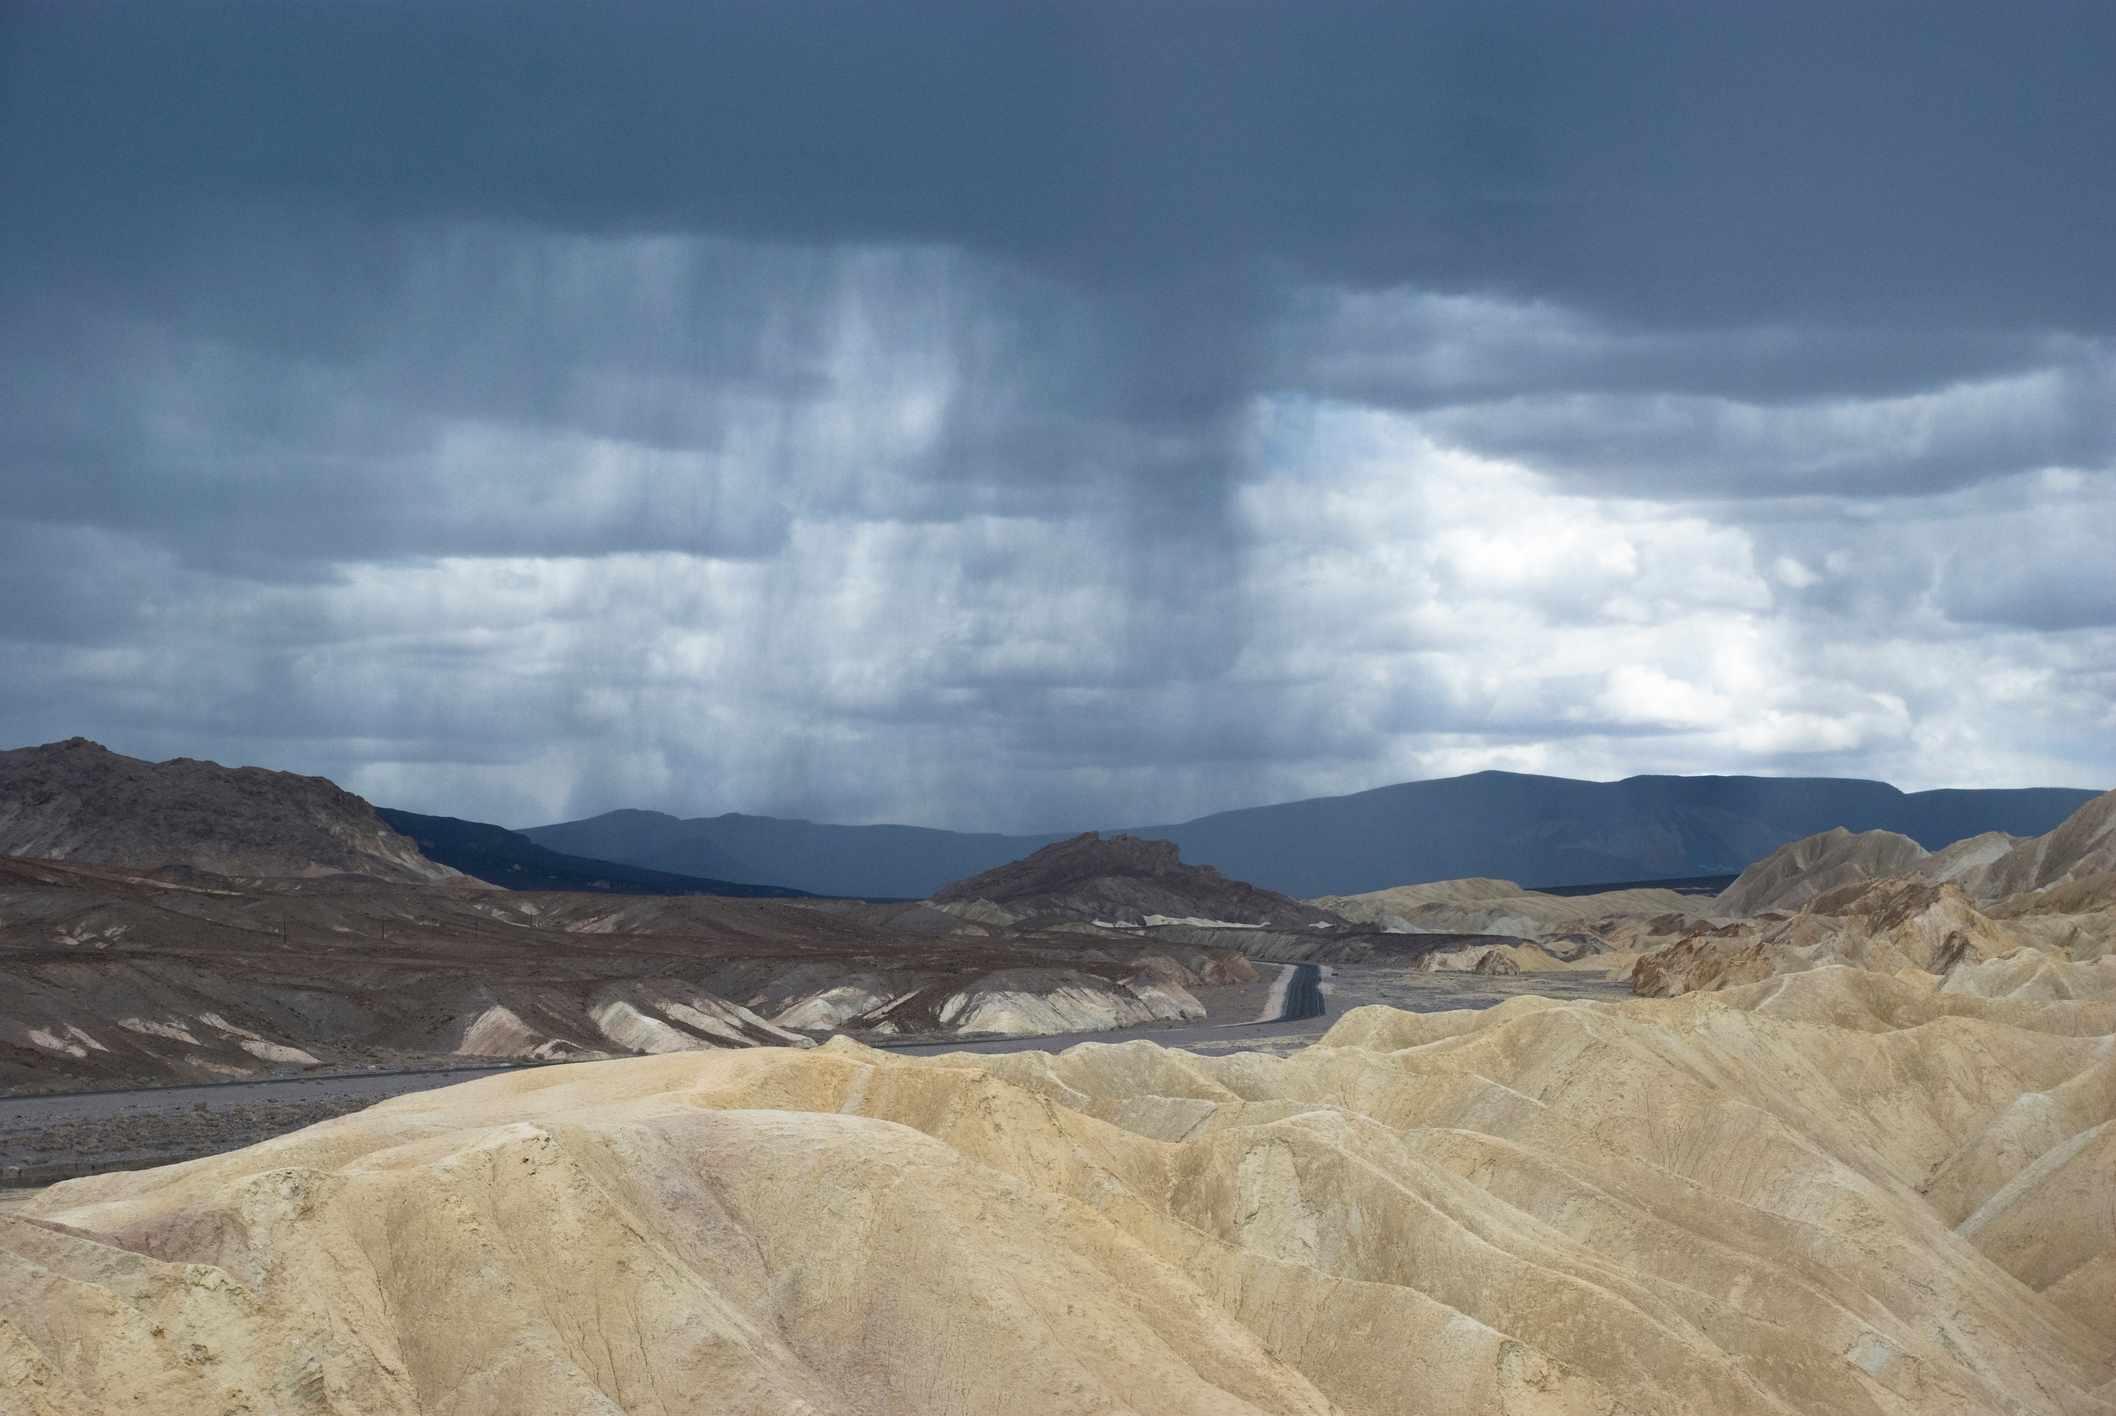 Rainstorm in Death Valley